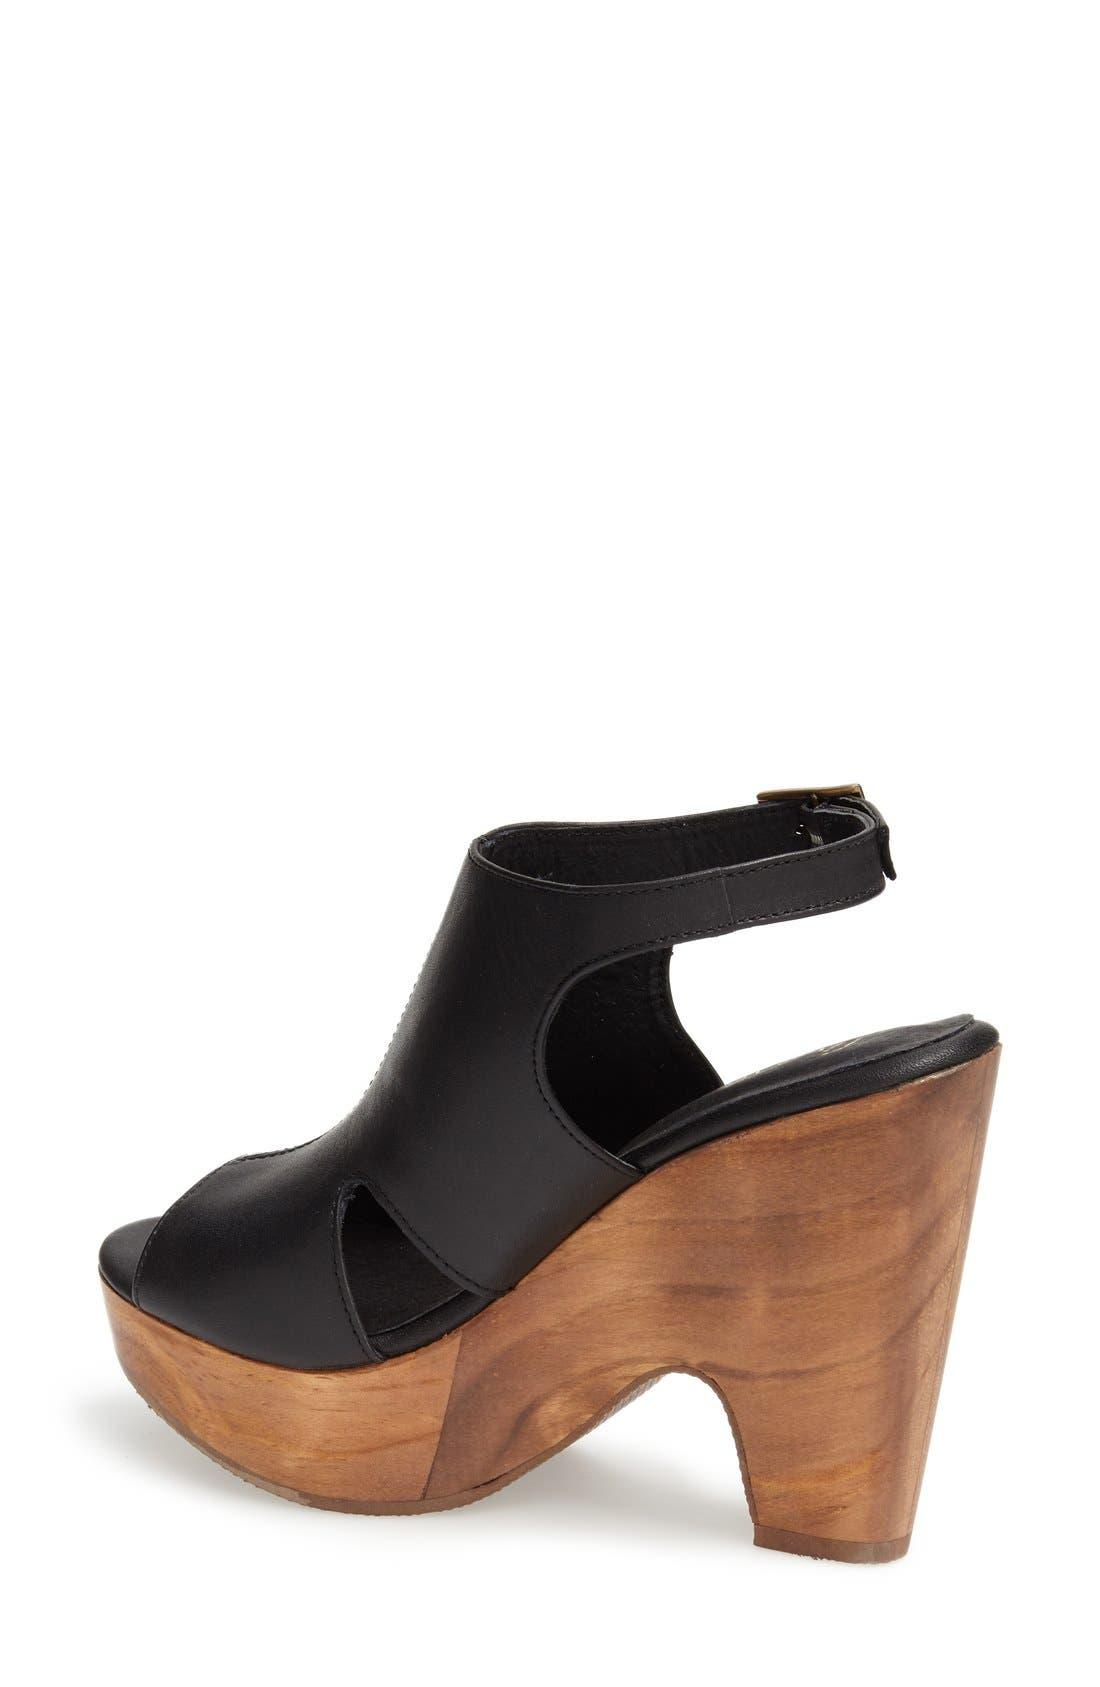 Alternate Image 2  - five worlds by Cordani 'Cabo' Slingback Platform Sandal (Women)